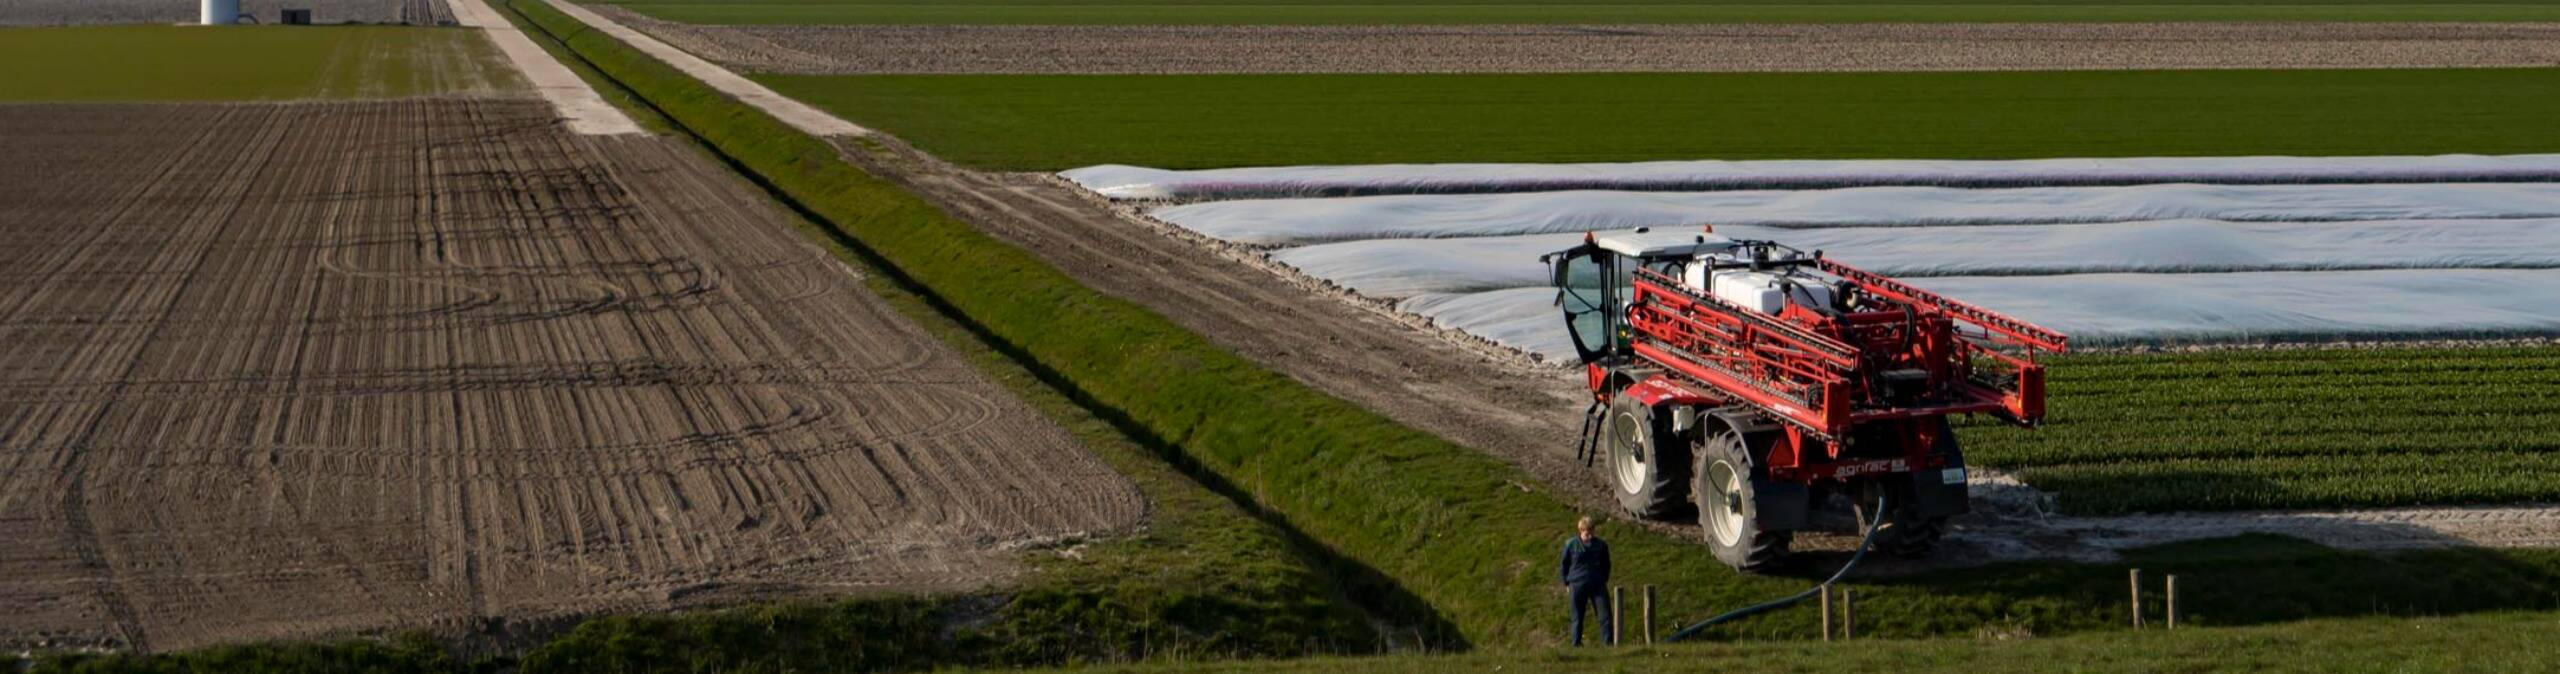 tulp_en_windmolens_-_...